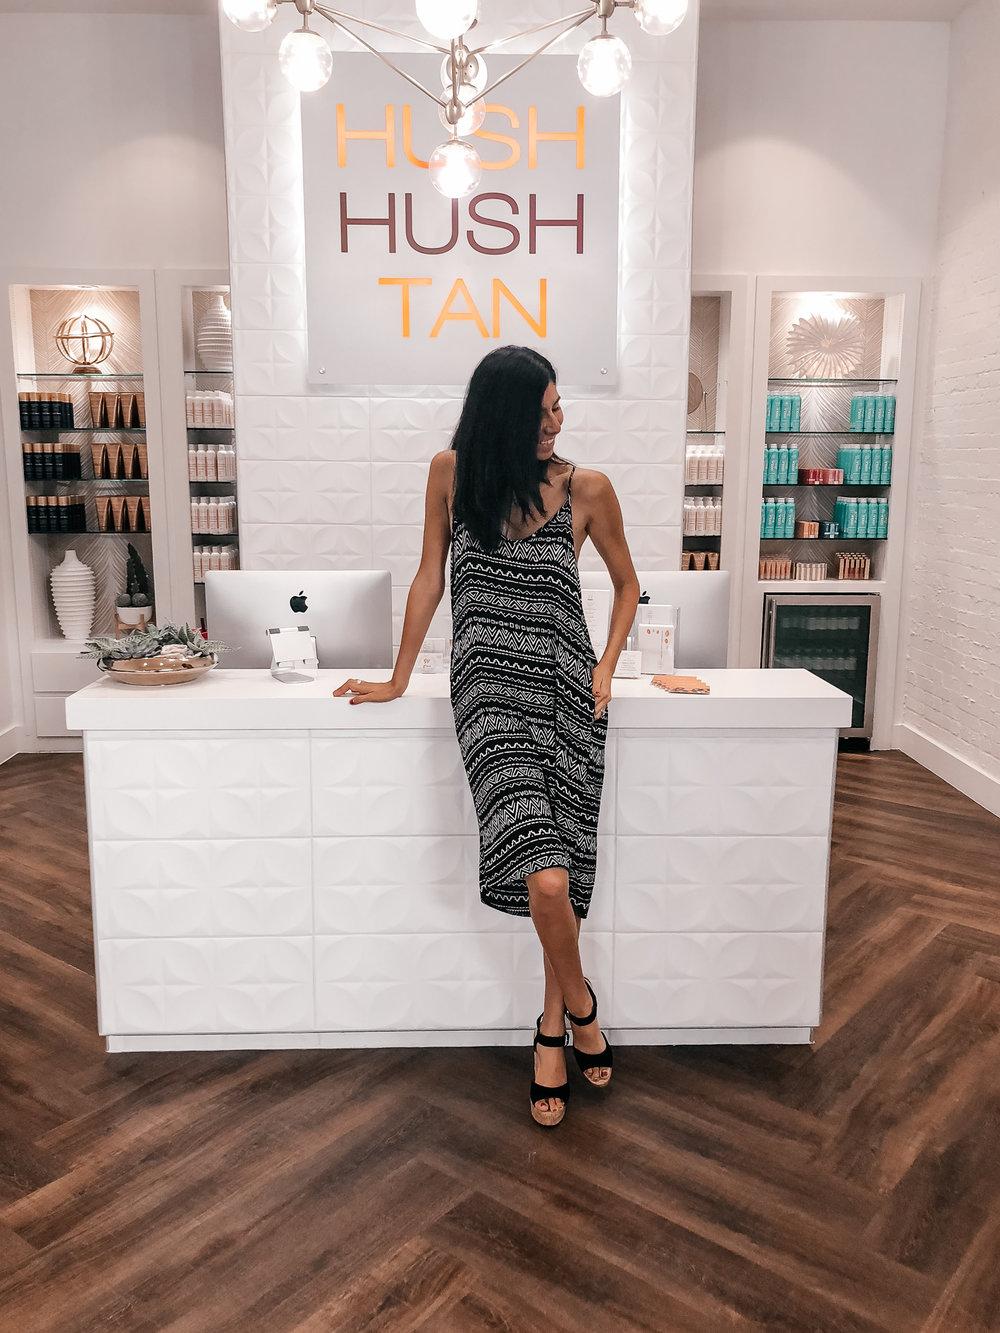 Hush Hush Tan Dallas Location